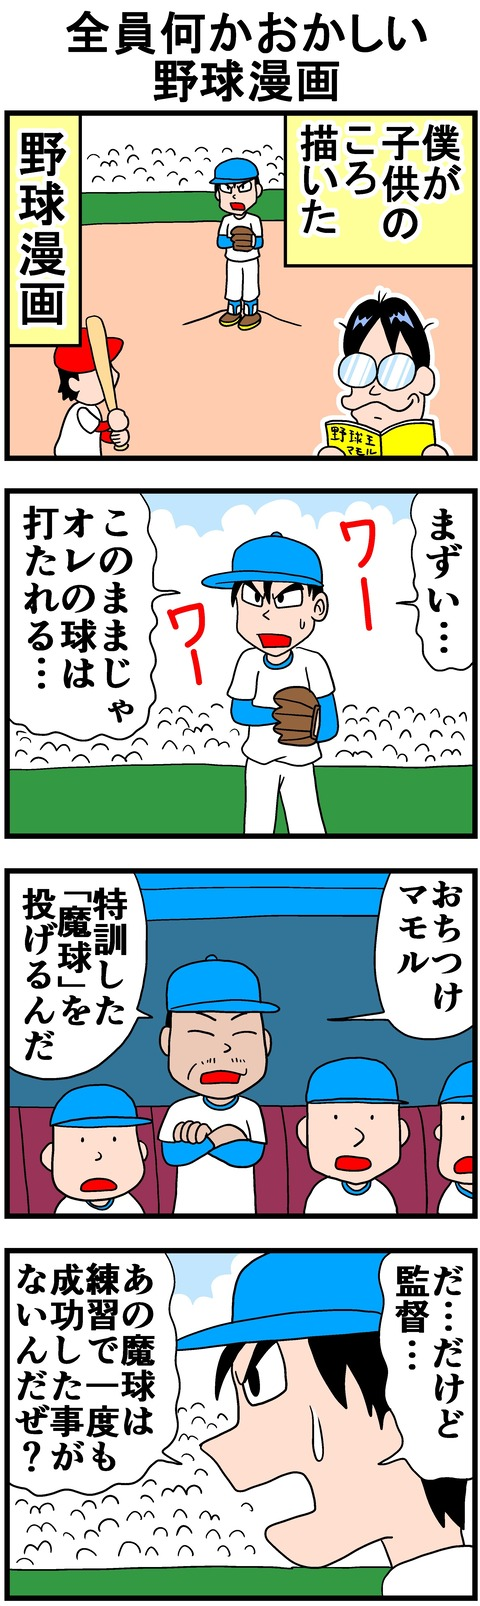 yakyuuokasii